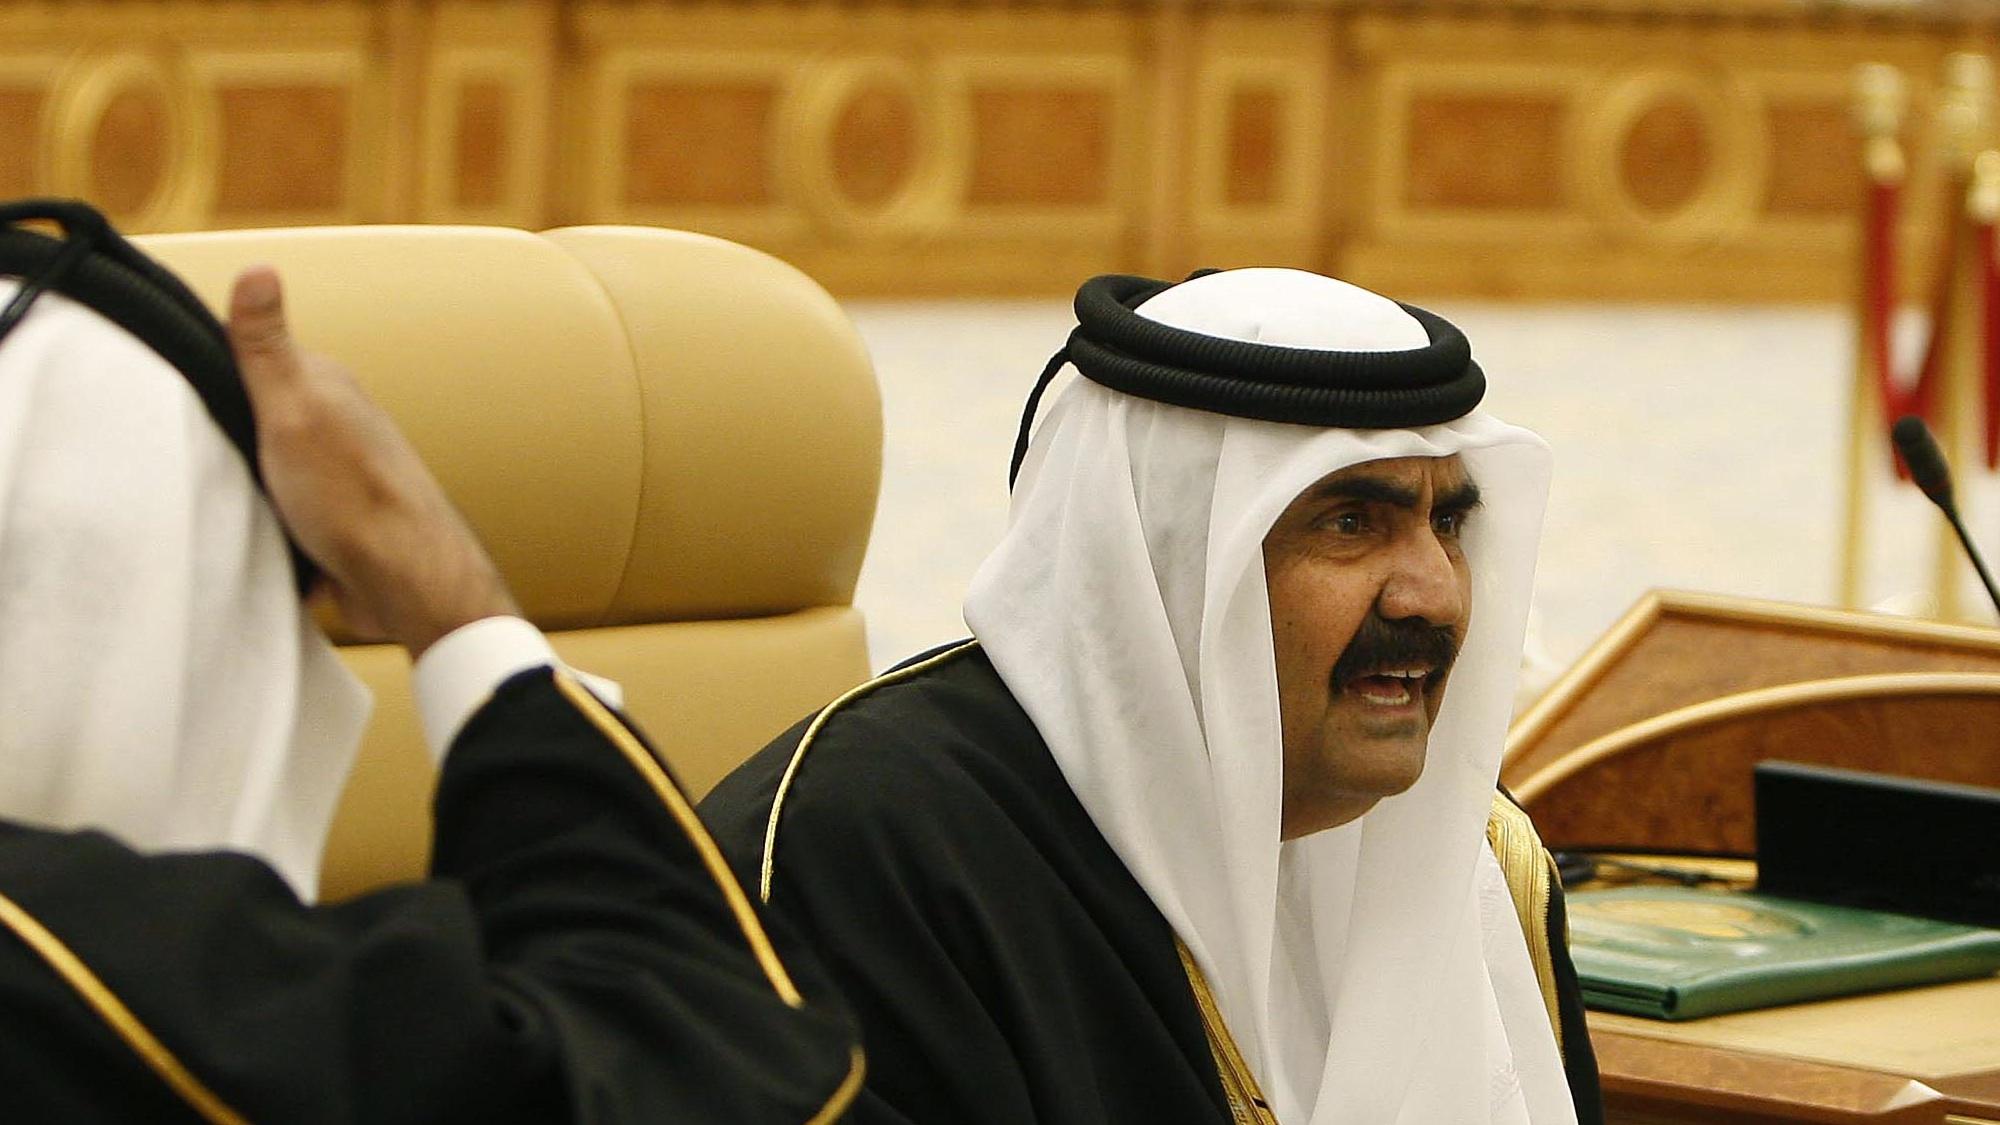 Qatar's Emir Sheikh Hamad bin Khalifa Al Thani